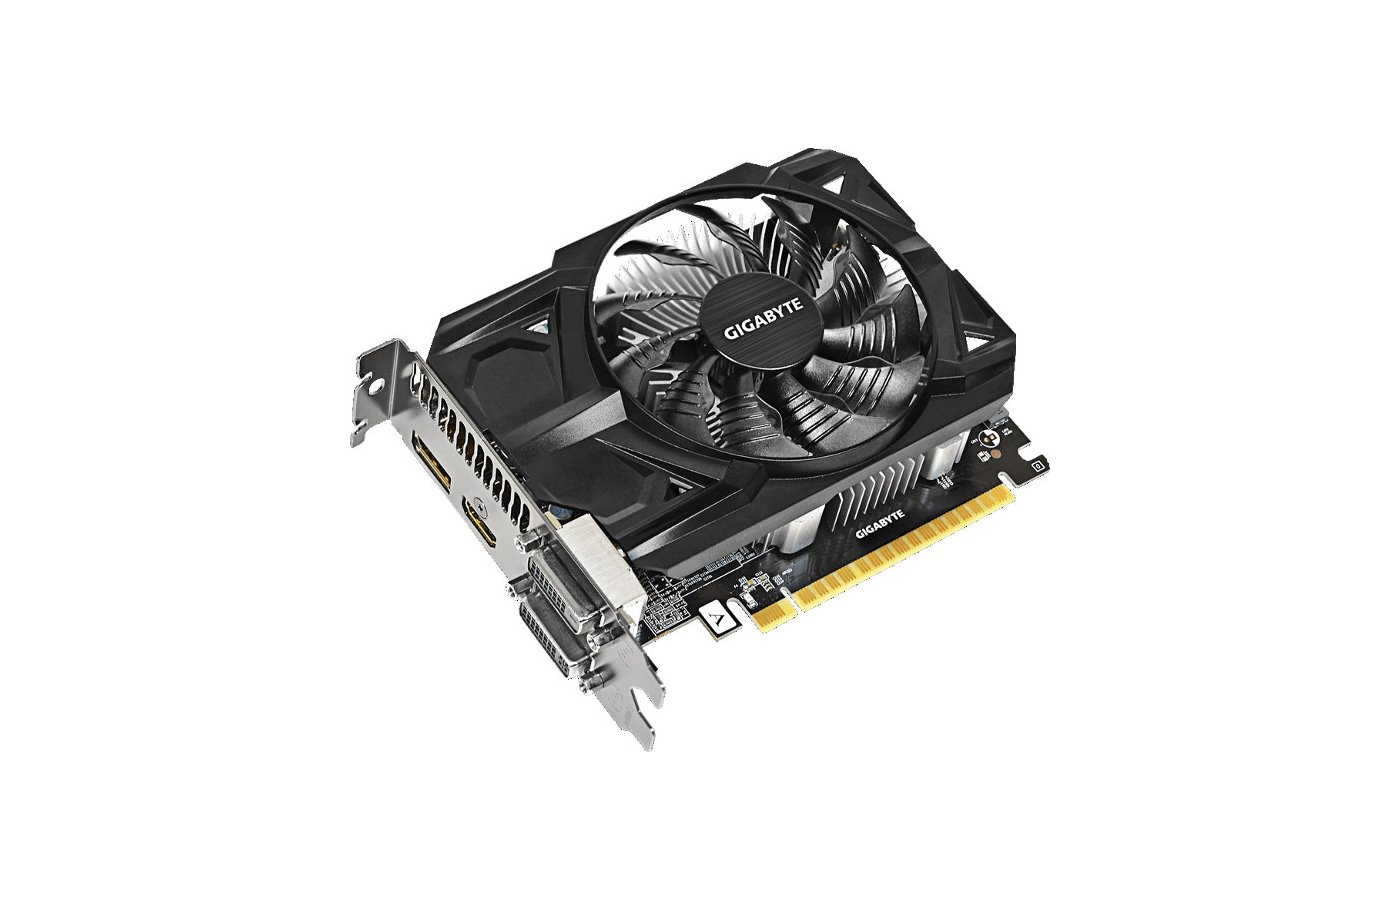 Видеокарта Gigabyte PCI-E GV-R736OC-2GD AMD Radeon R7 360 2048Mb 128bit Ret